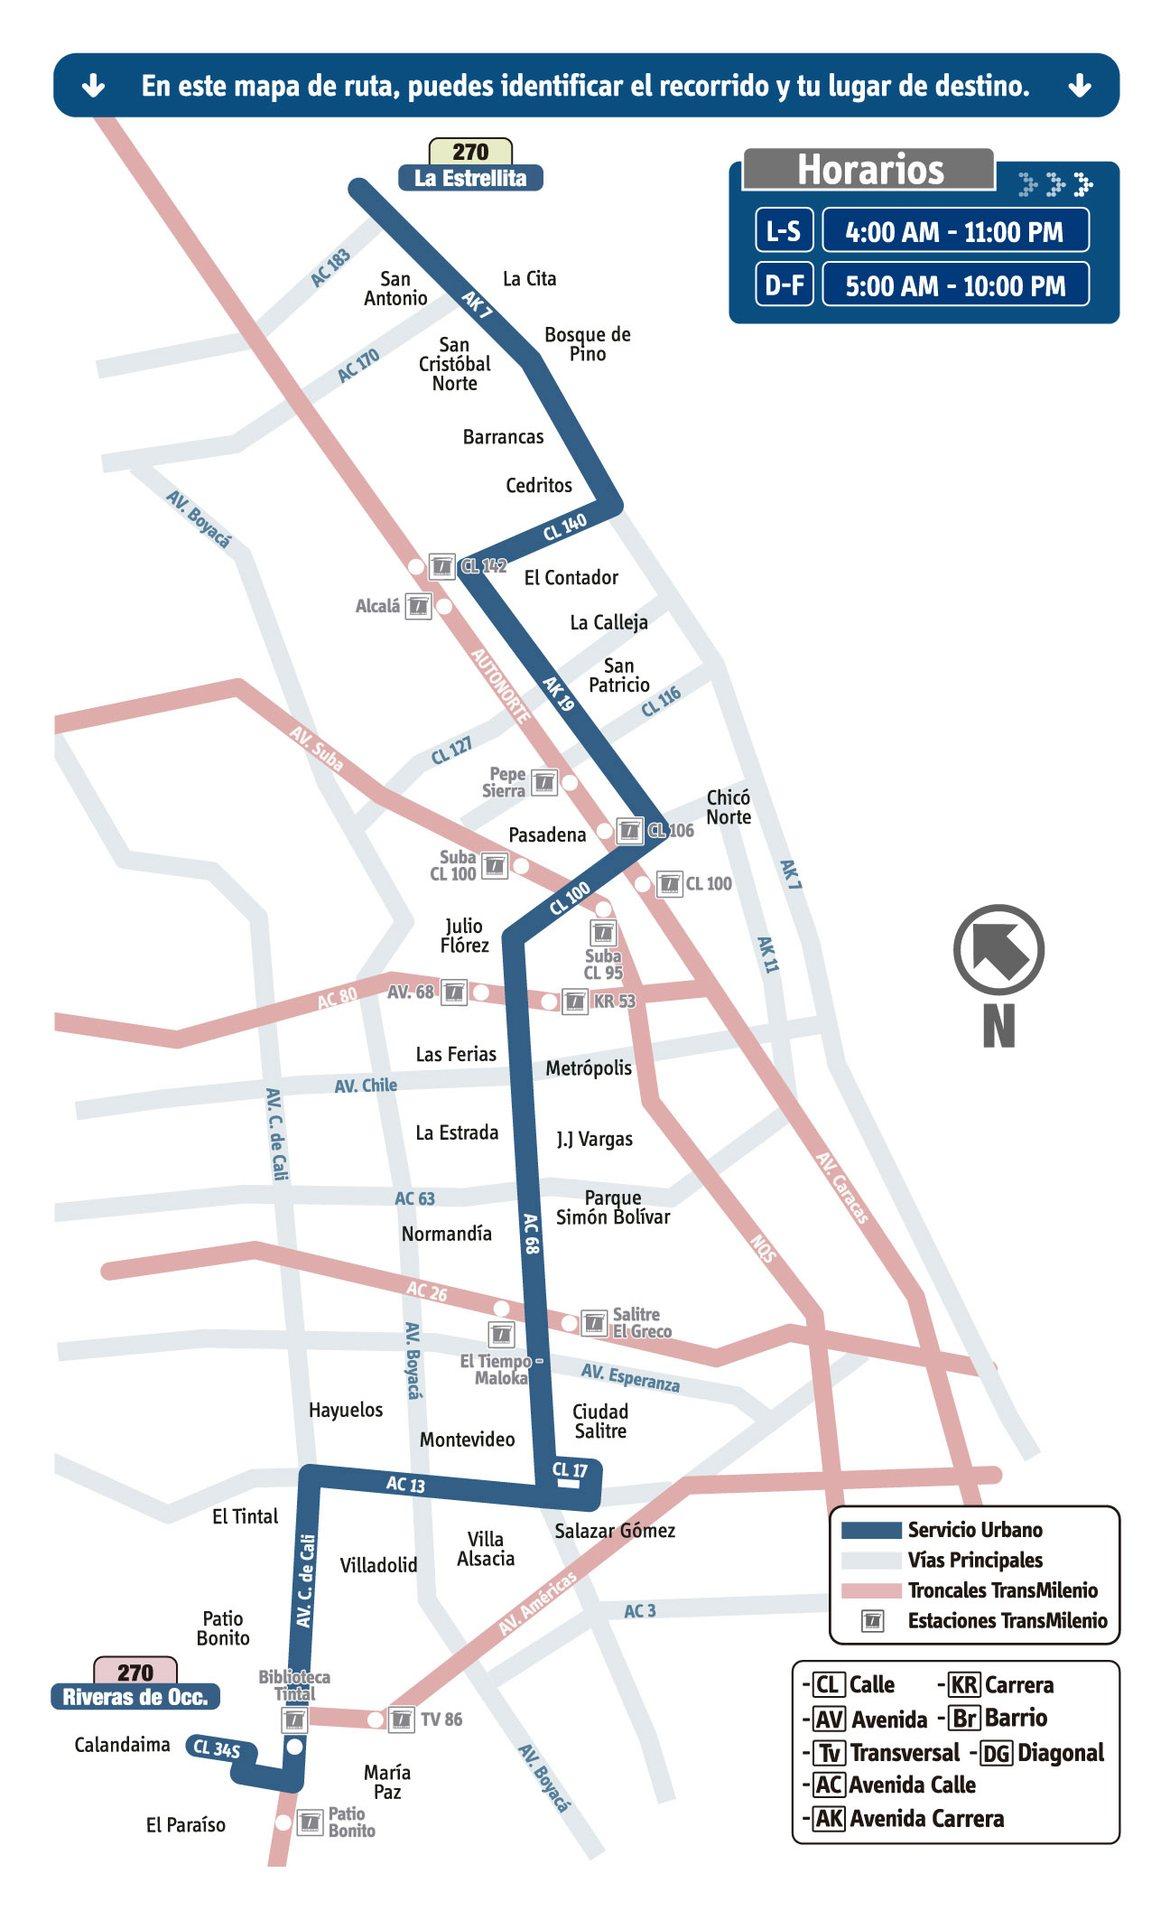 Ruta SITP: 270 La Estrellita ↔ Riveras de Occidente [Urbana] 5